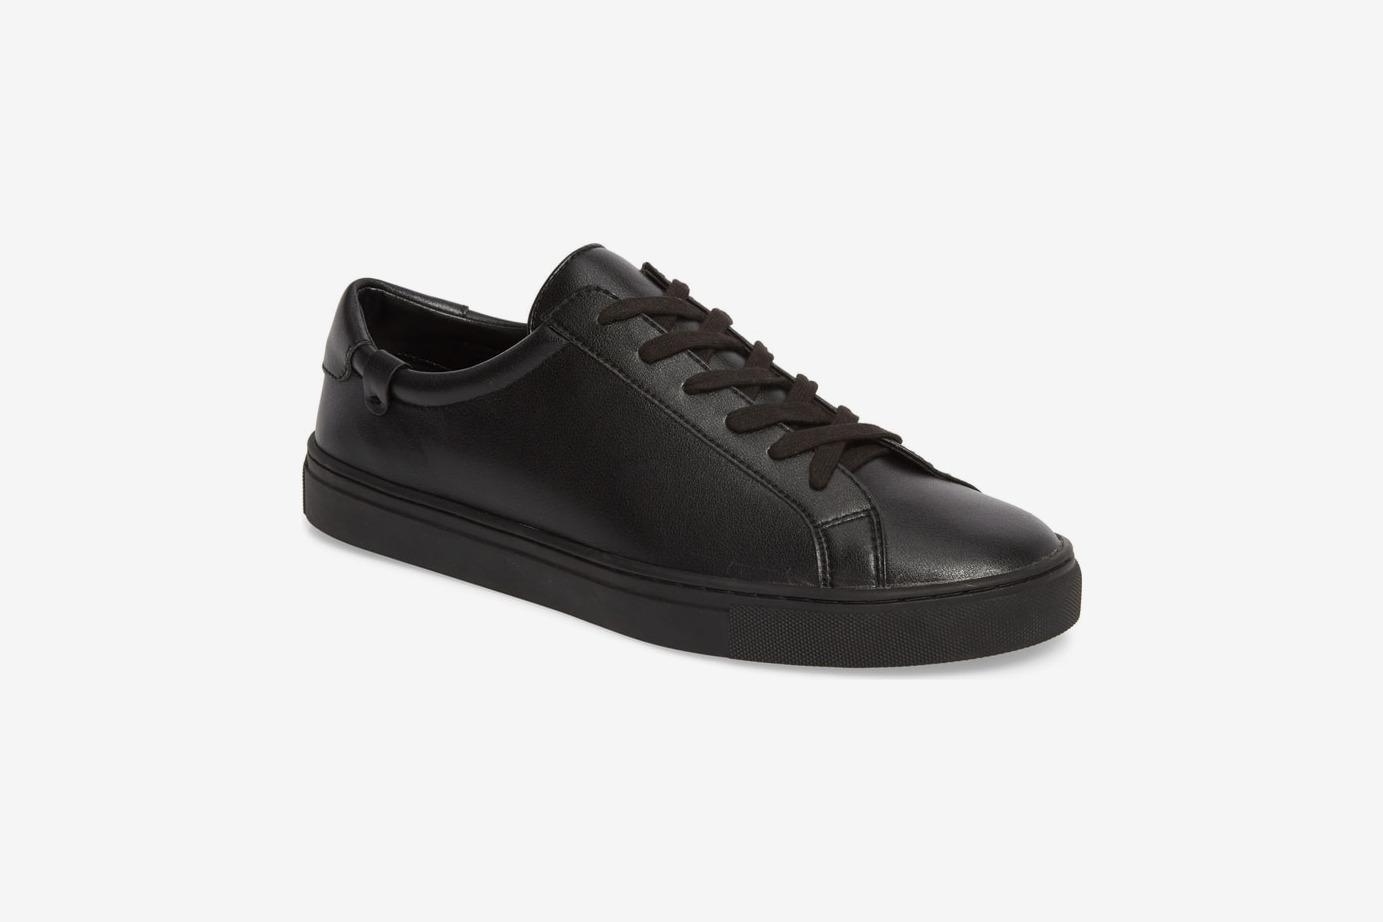 2dbd7a5c0b House of Future Original Low Top Sneaker